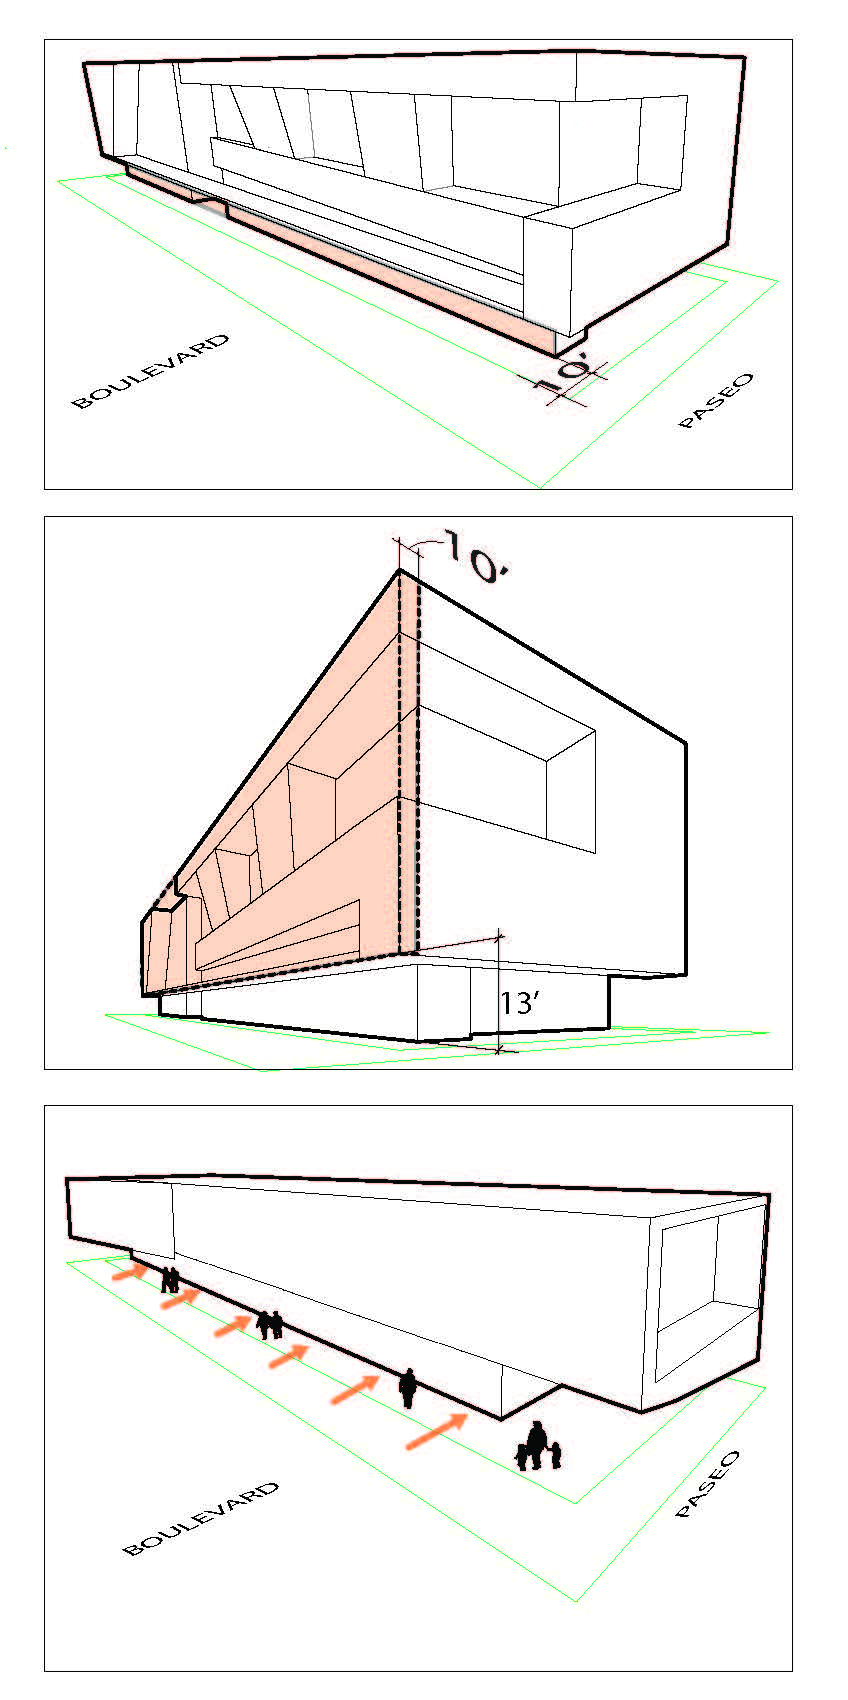 BLVD_Perspective.jpg